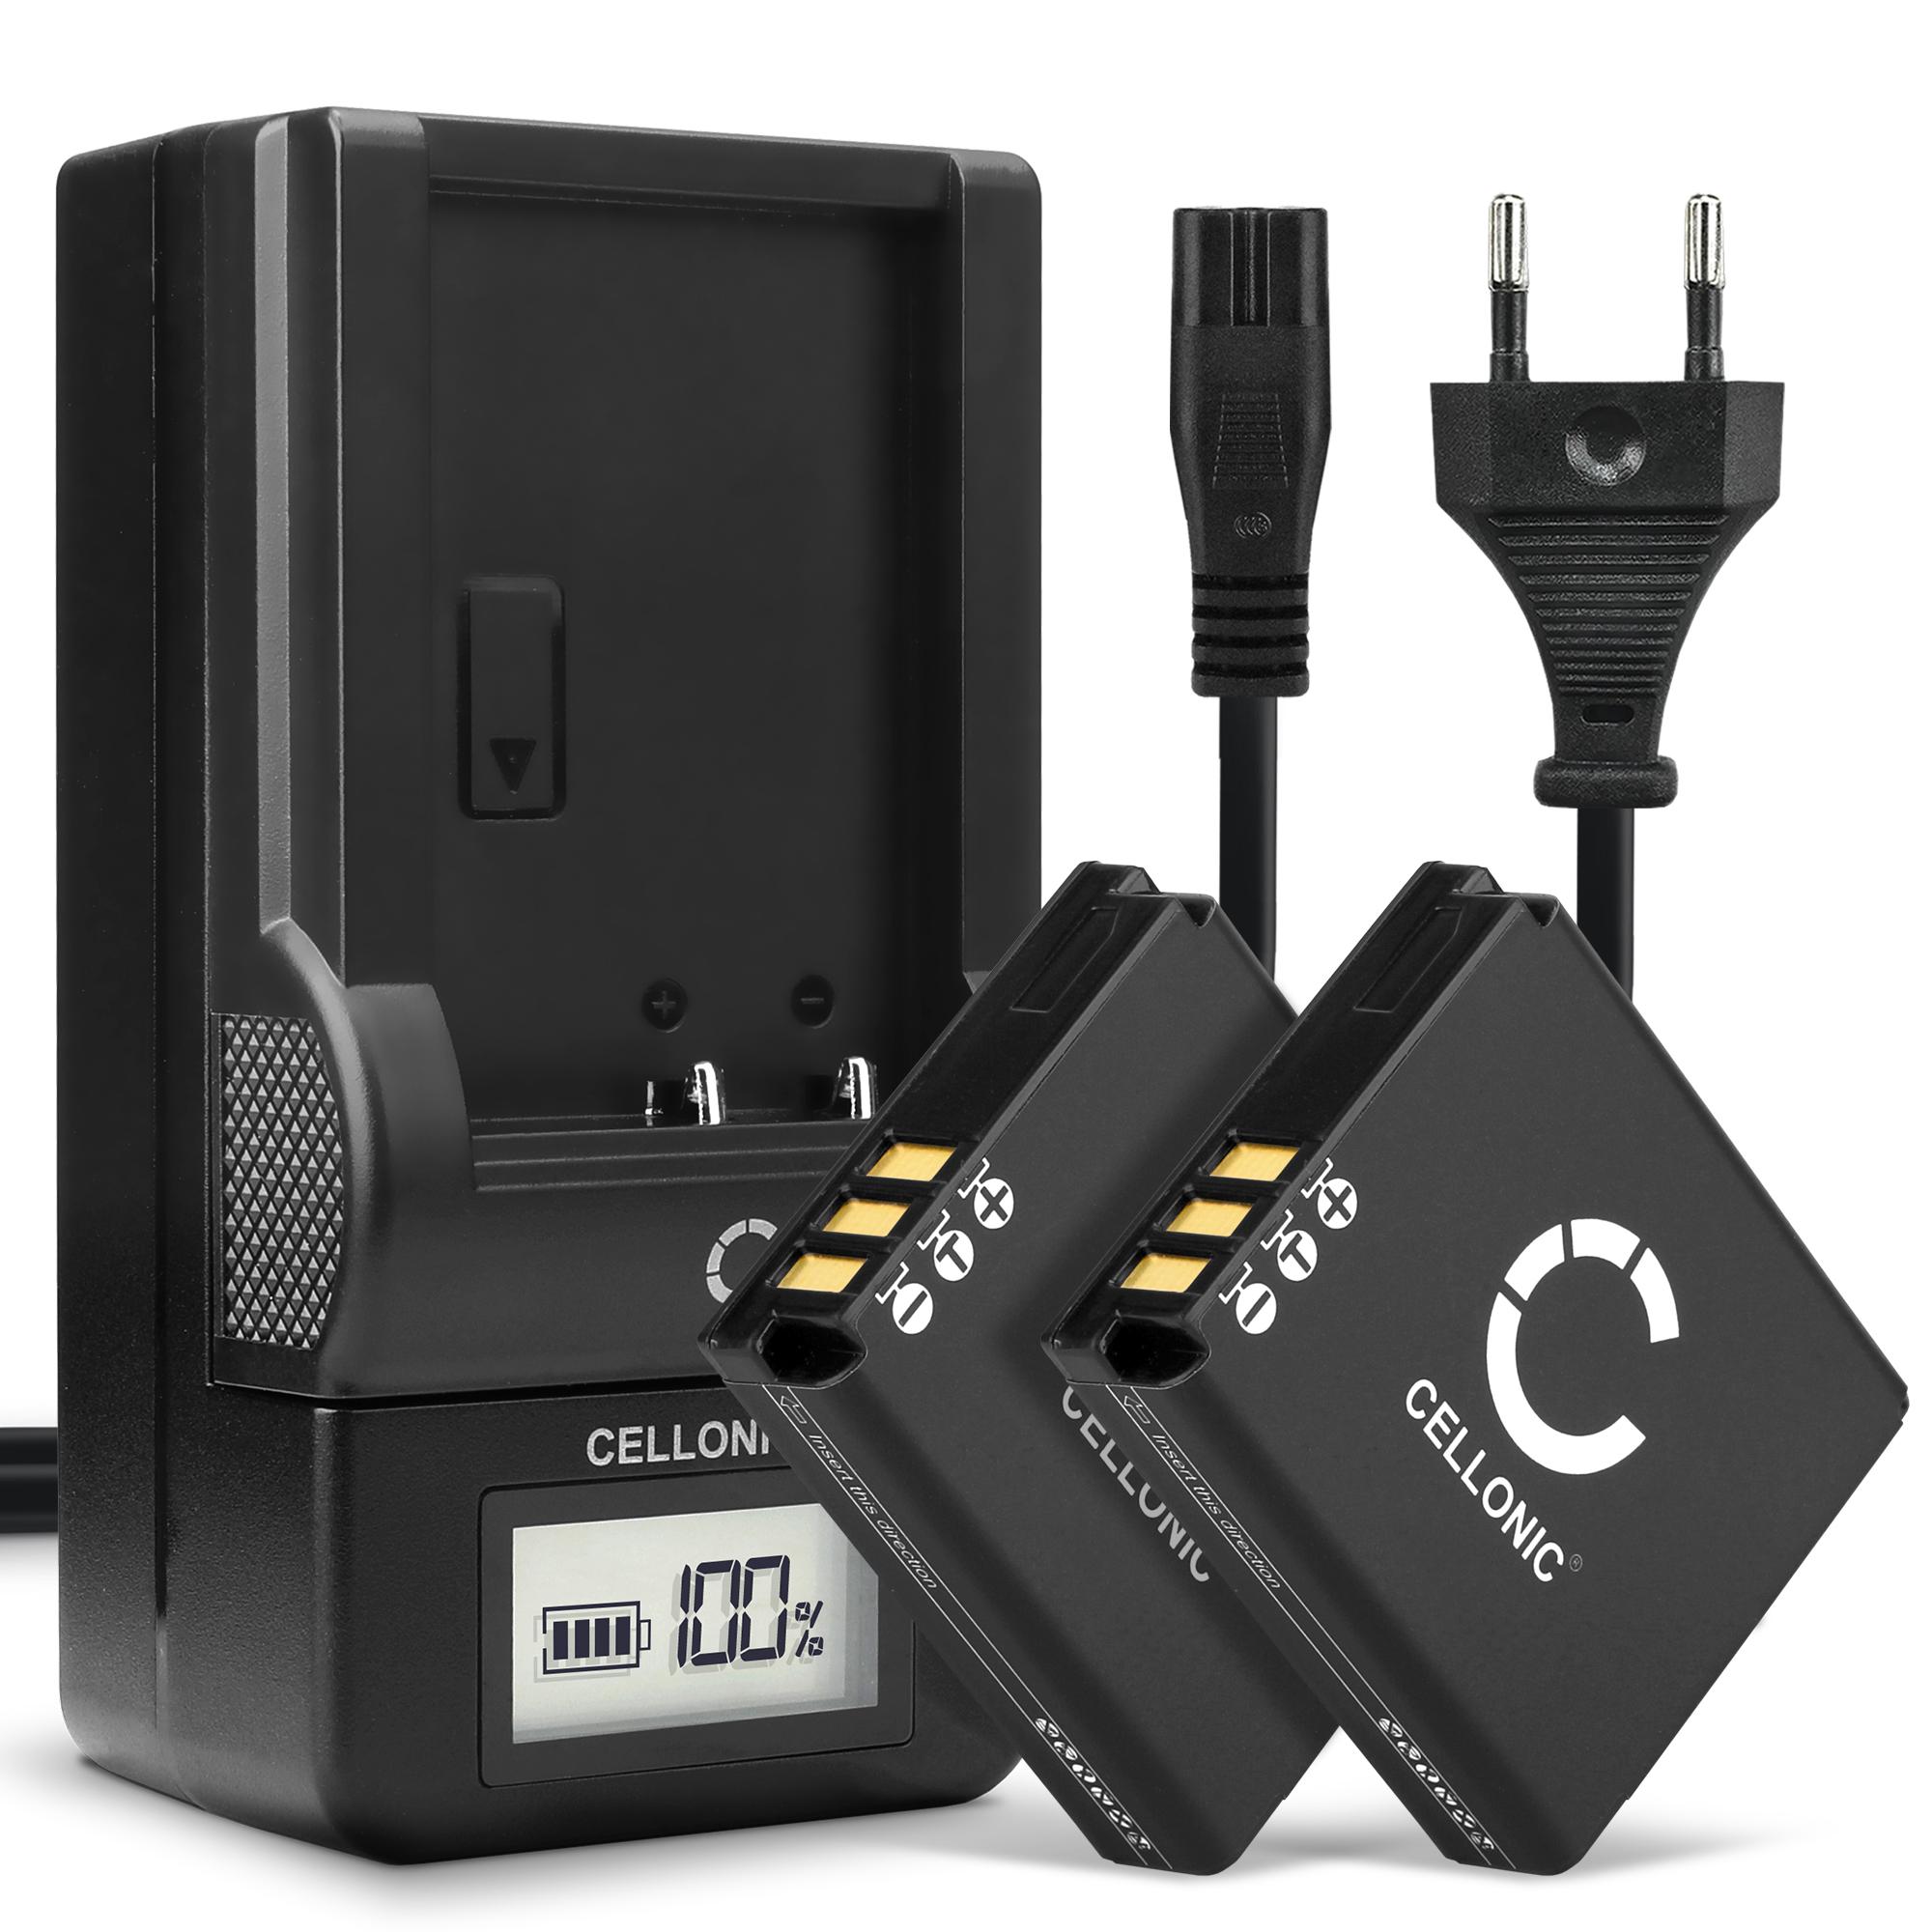 Panasonic de-a12 cargadores dmw-bcc12 batería dmc-lx3 lx1 lx2 fx8 fx9 fx100 fx150